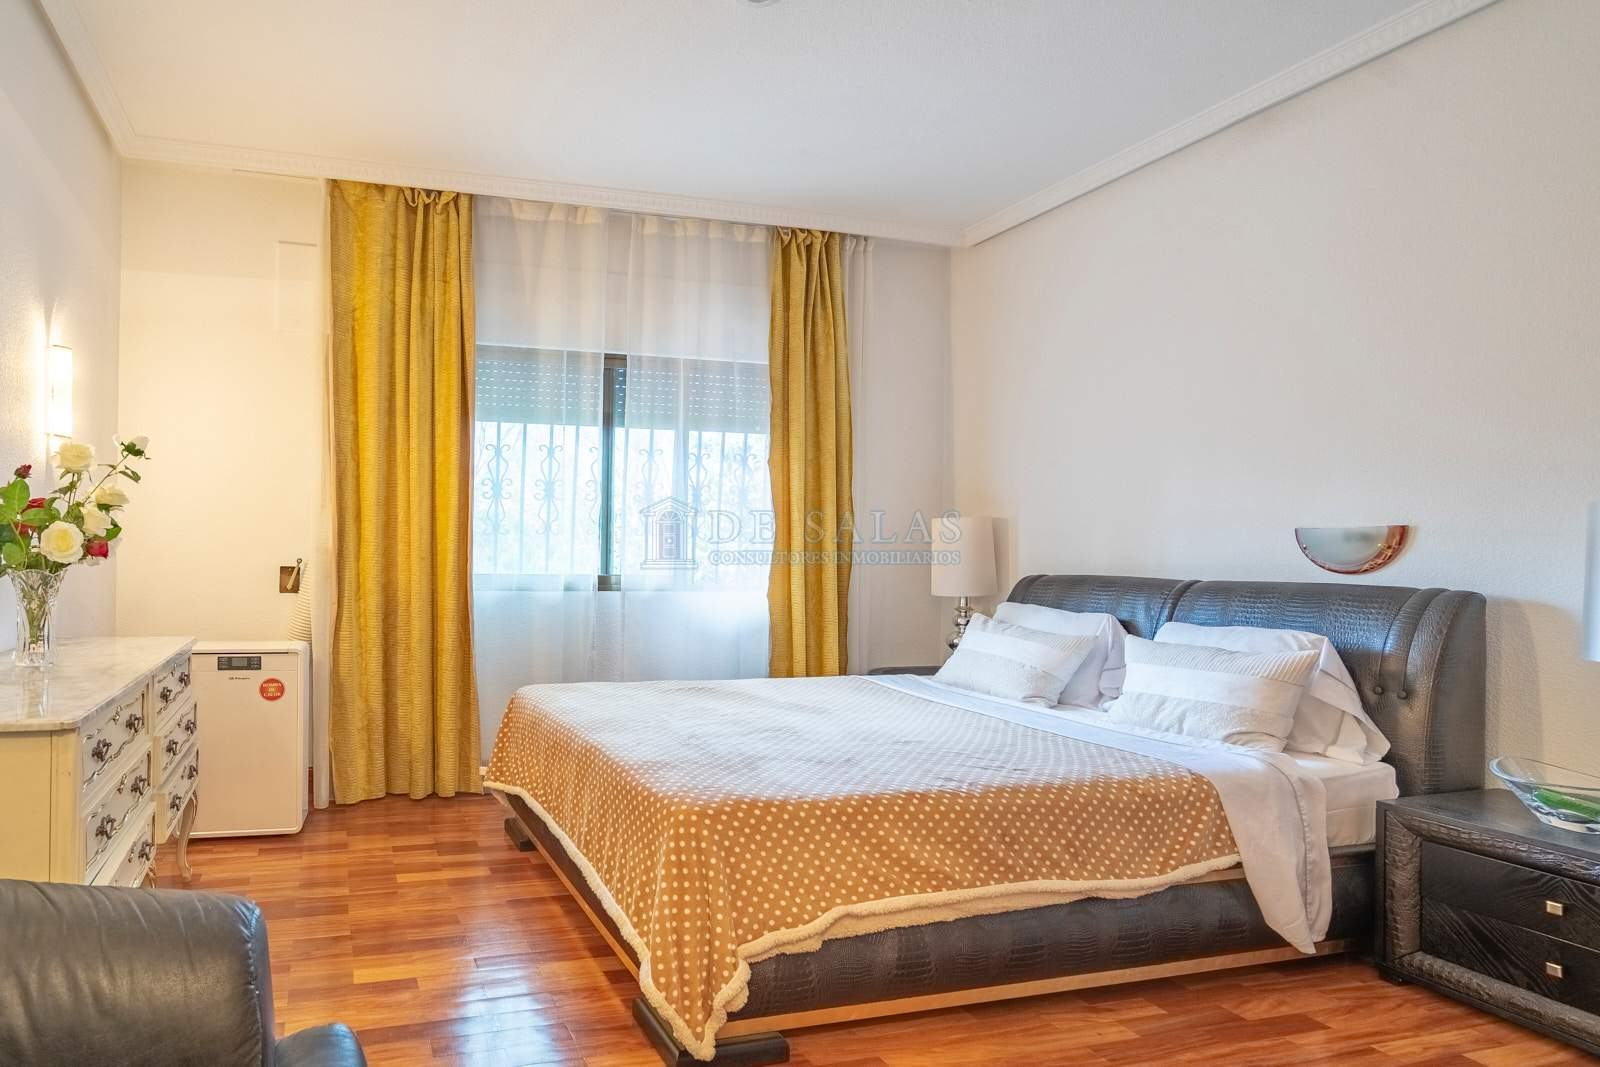 27-Dormitorio Chalet La Moraleja